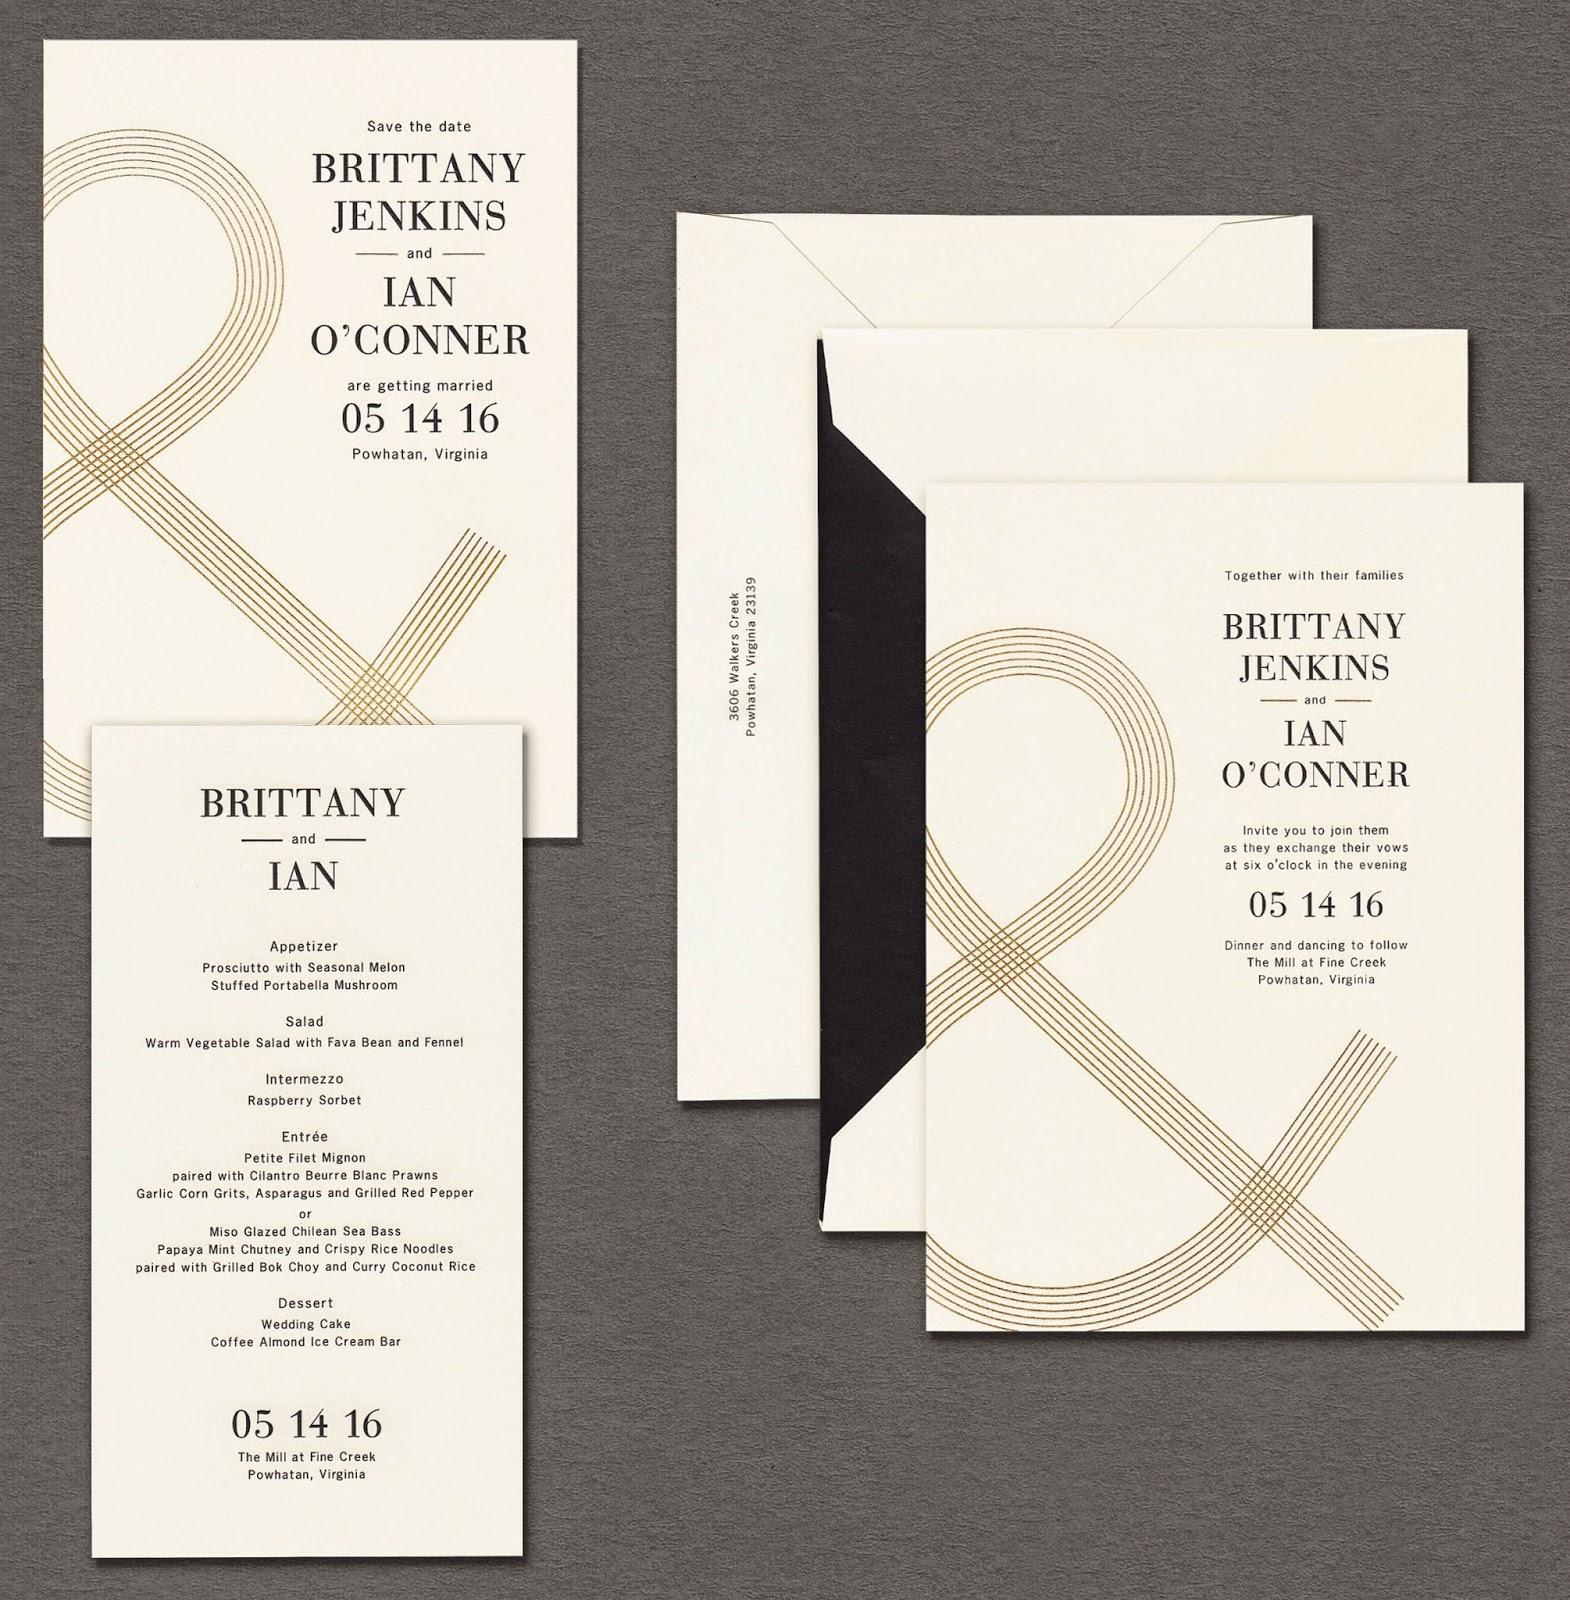 william arthur blog: our new vera wang wedding album: gold glamour, Wedding invitations